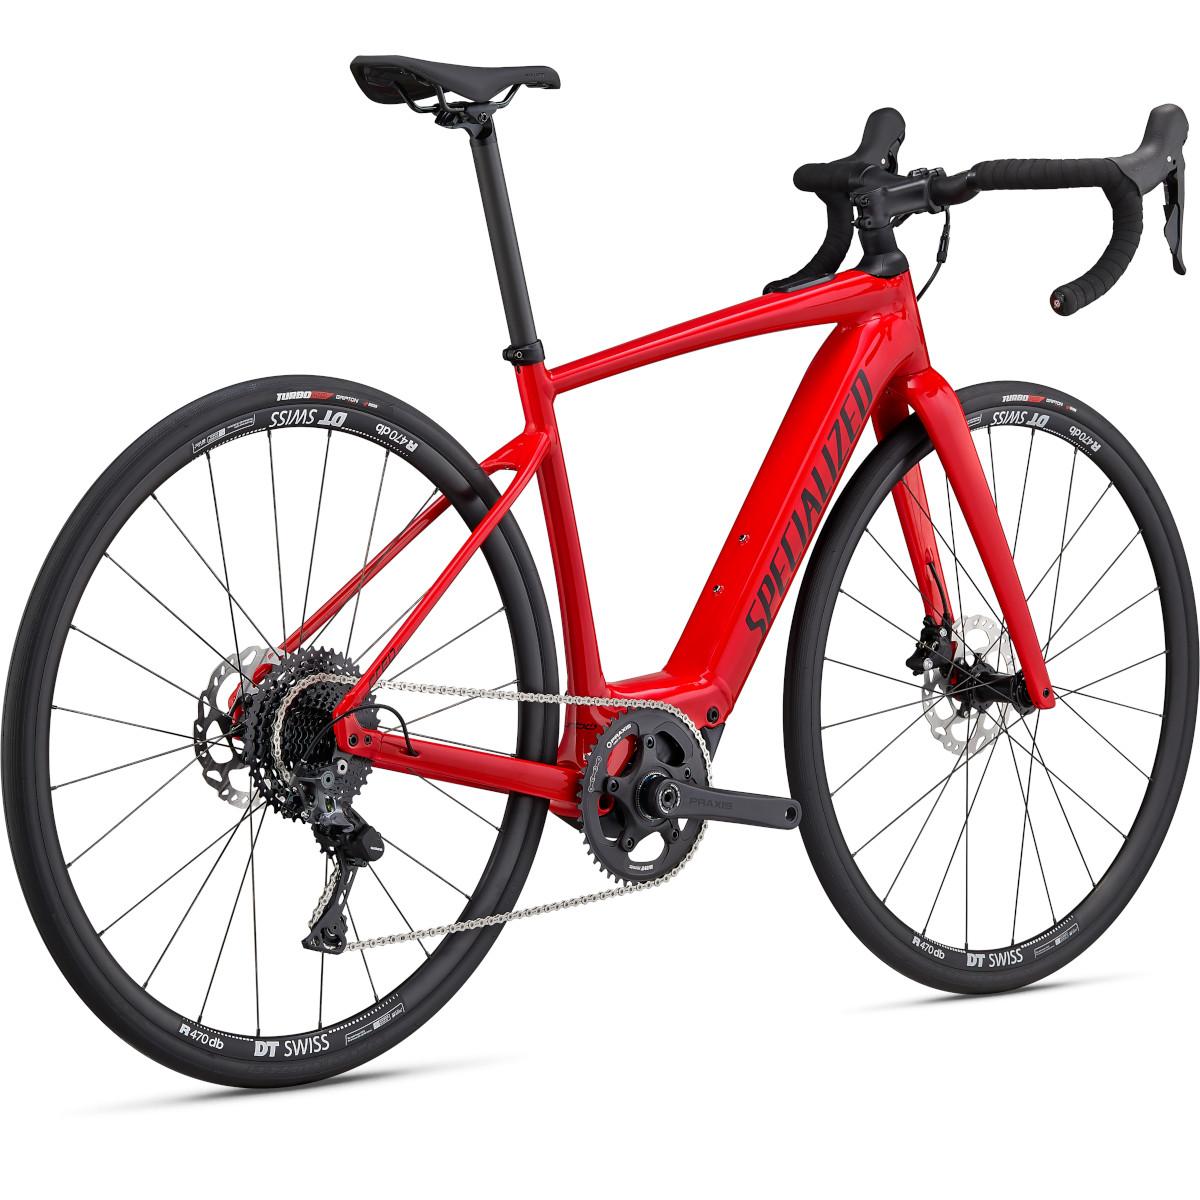 Bild von Specialized TURBO CREO SL COMP E5 - Gravel E-Bike - 2022 - flo red / black